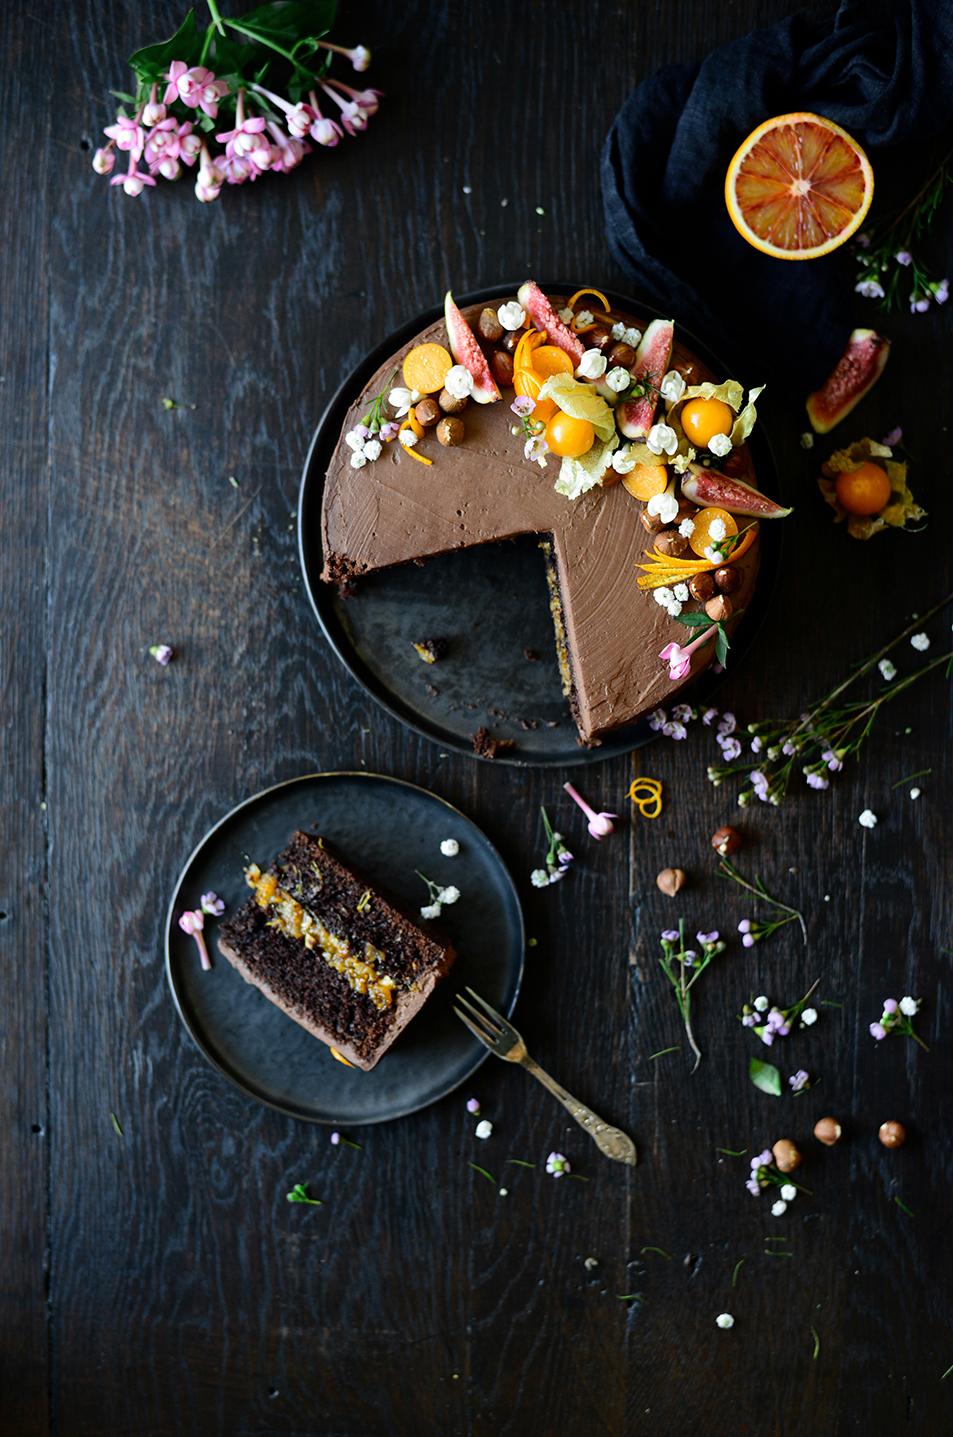 serving dumplings | Chocoladecake met sinaasappel en vijgen